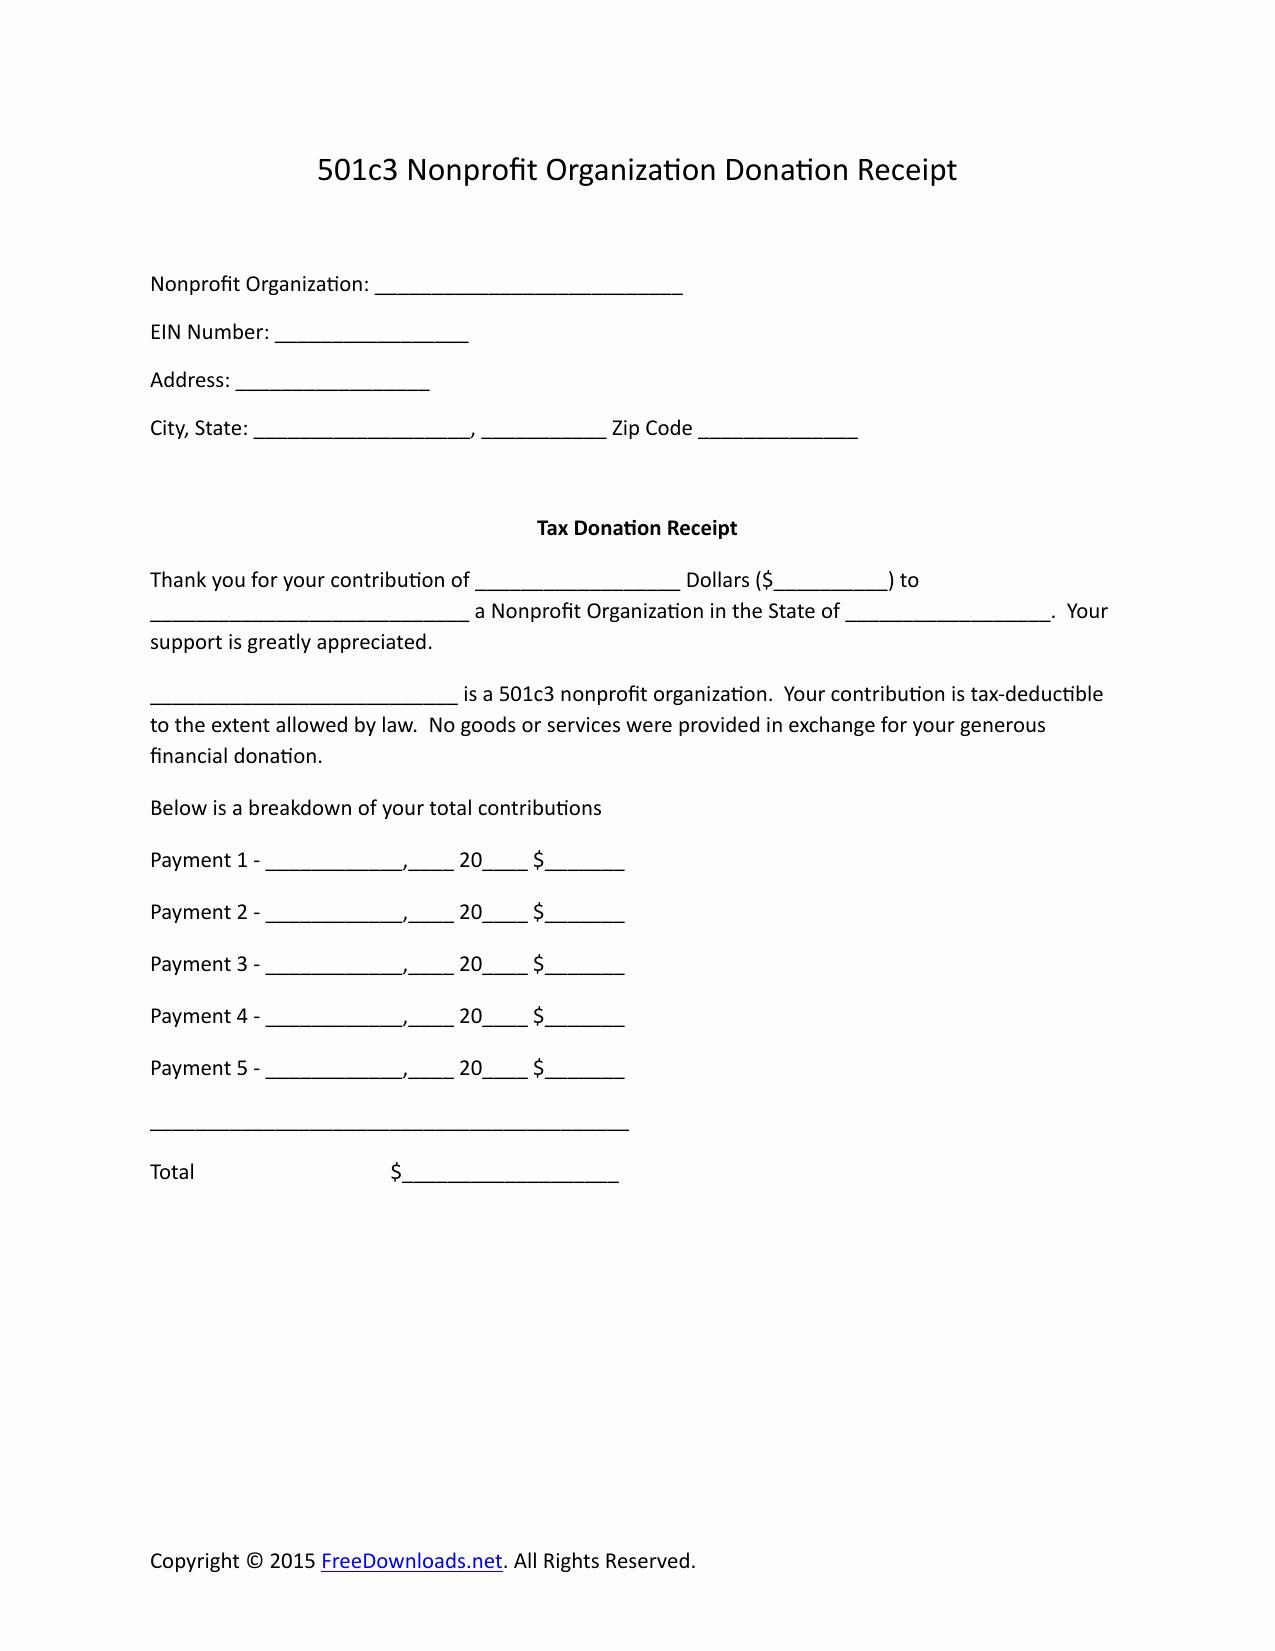 Receipt for Tax Deductible Donation Fresh Nonprofit Gift Acknowledgement Letter